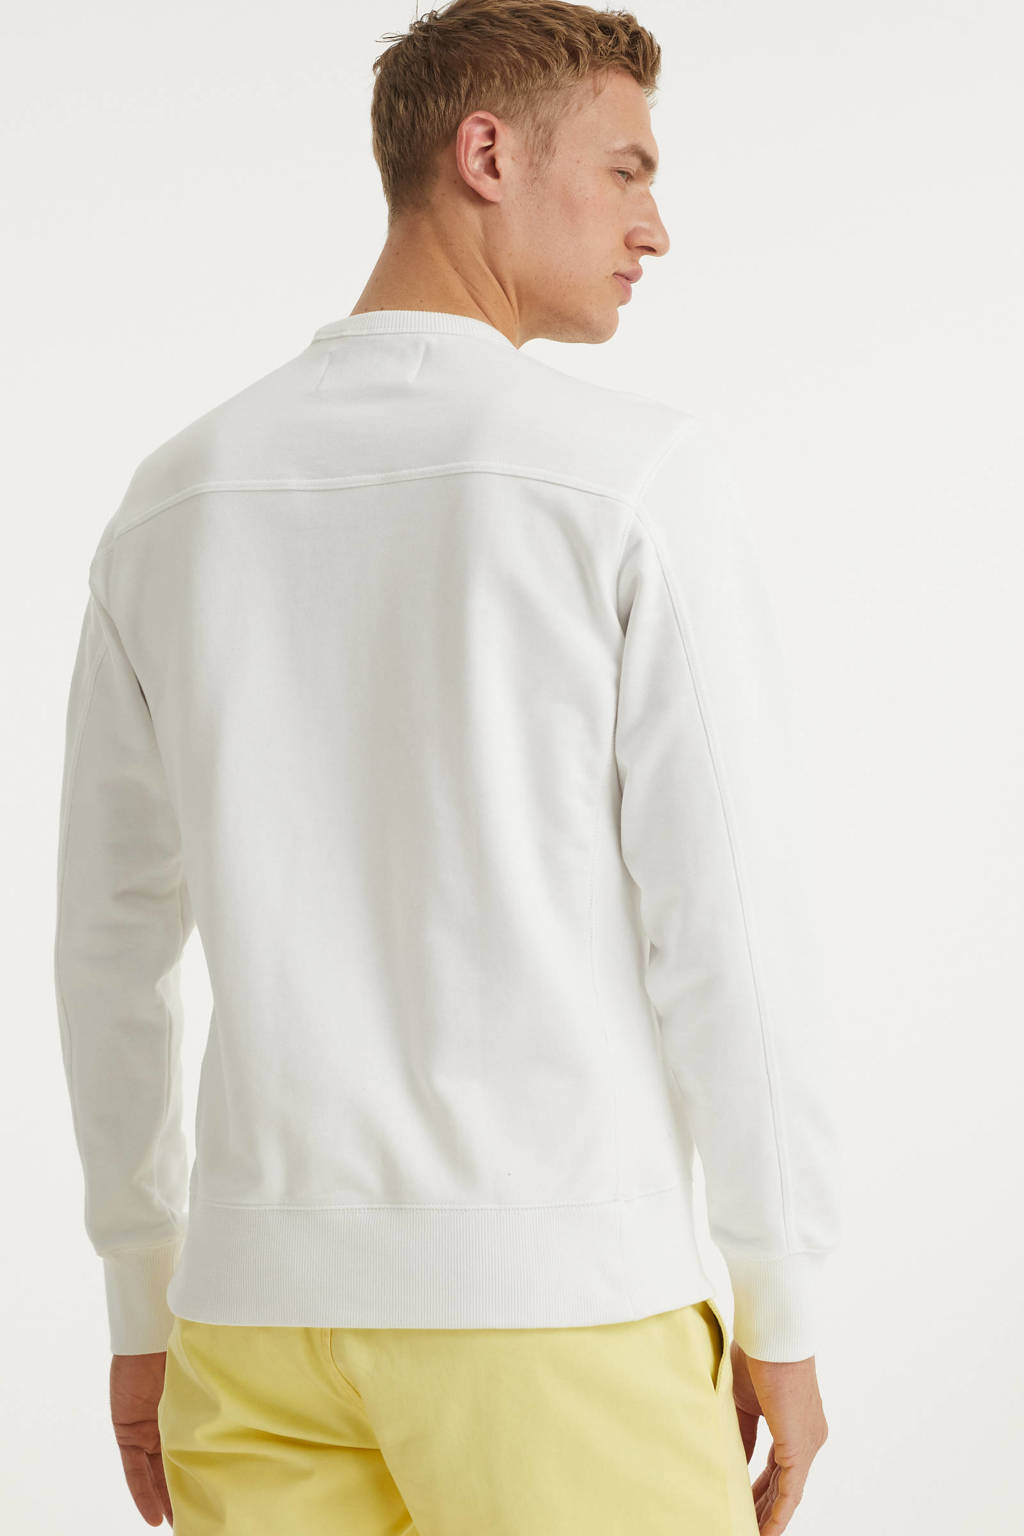 CALVIN KLEIN JEANS sweater met logo wit, Wit